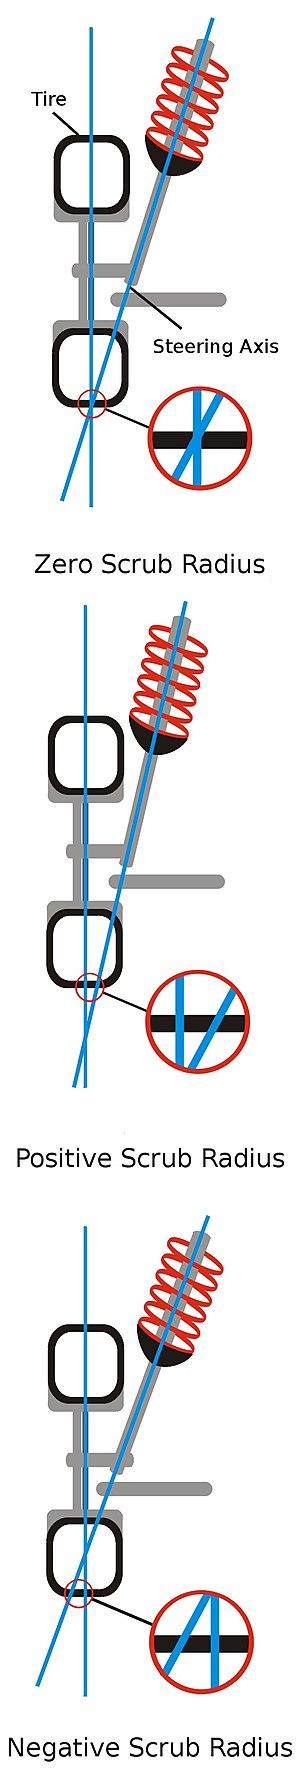 Scrub radius - Zero scrub radius (top) positive scrub radius (center) negative scrub radius (bottom)